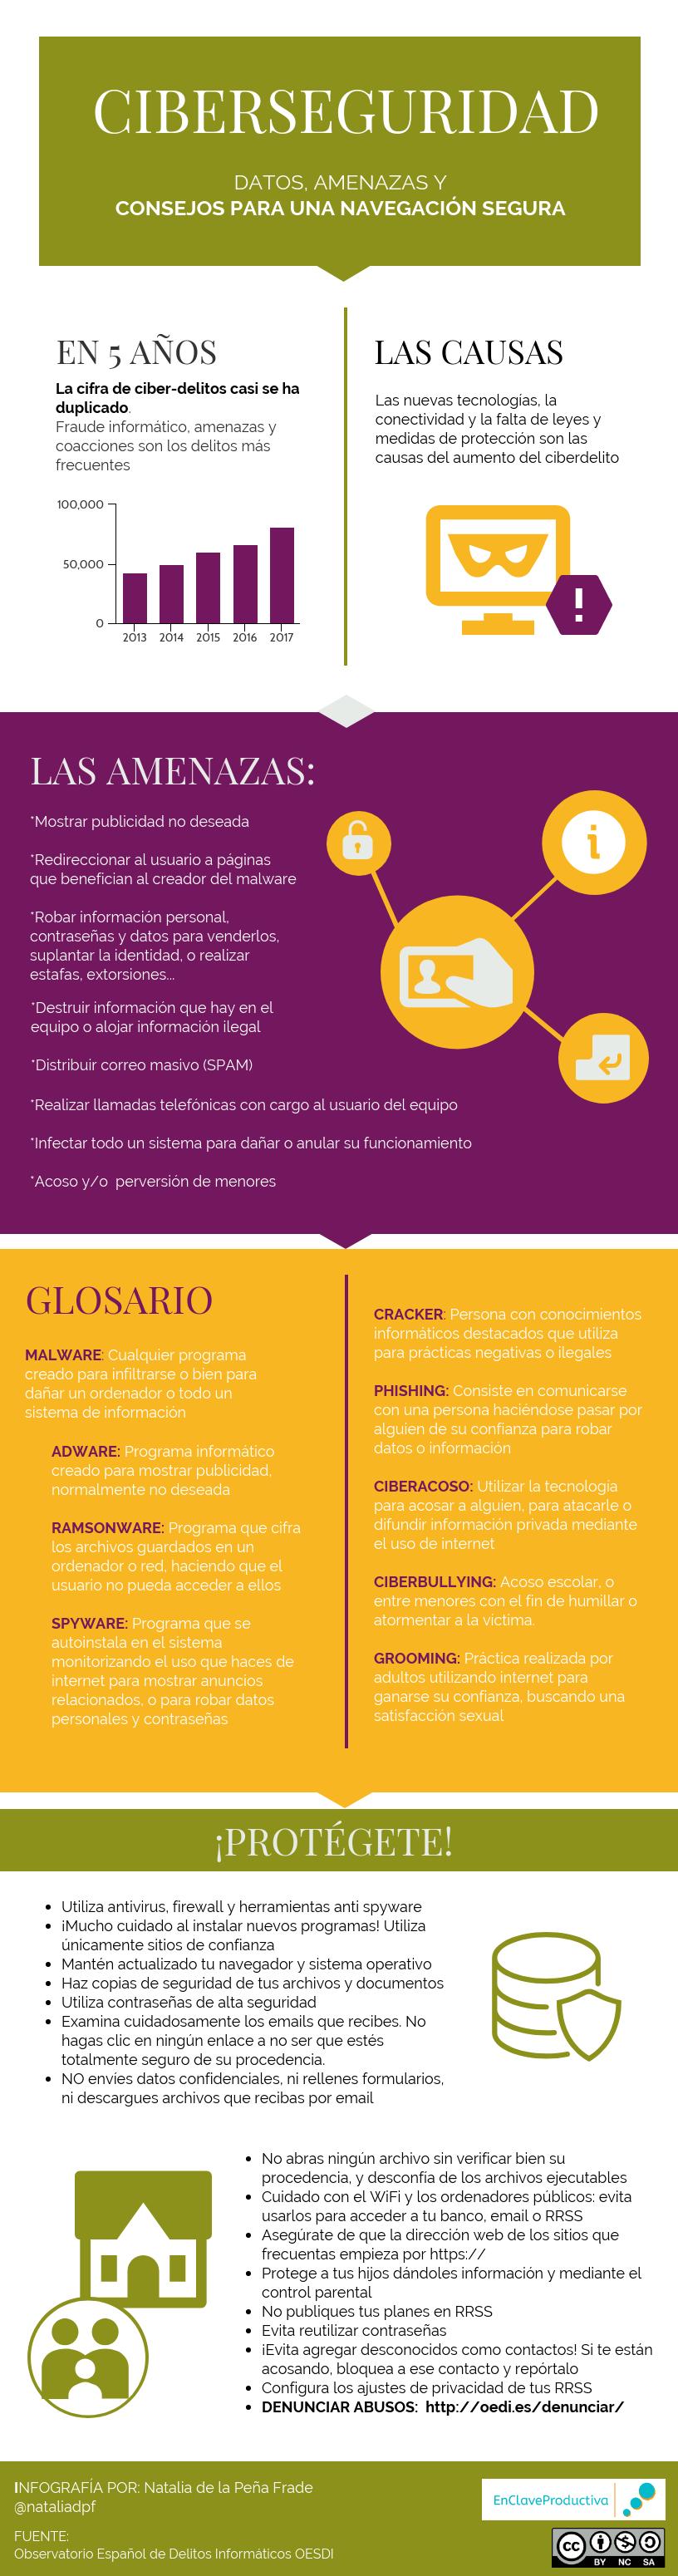 ciberseguridad-infografia-consejos